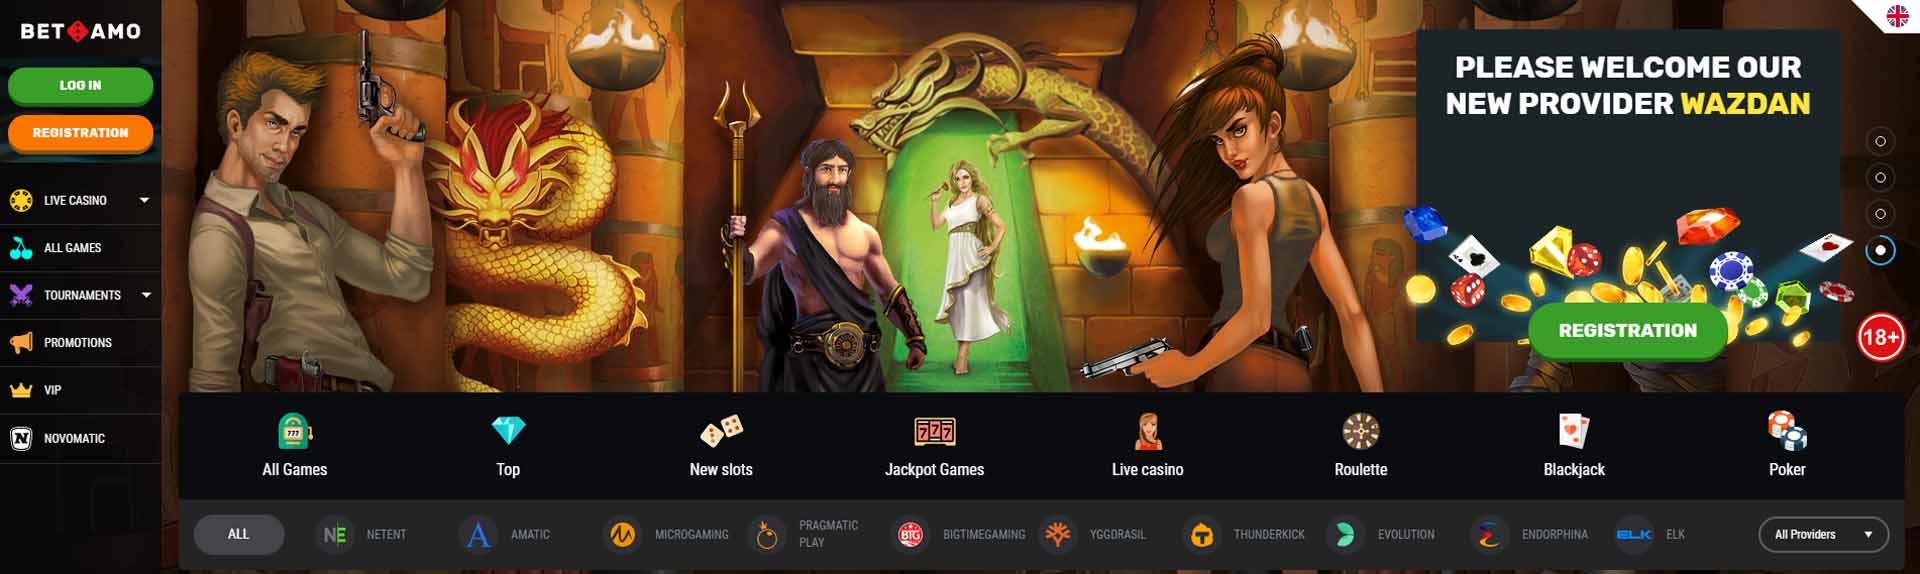 Betamo Online Casino Review And Bonus Aboutslots